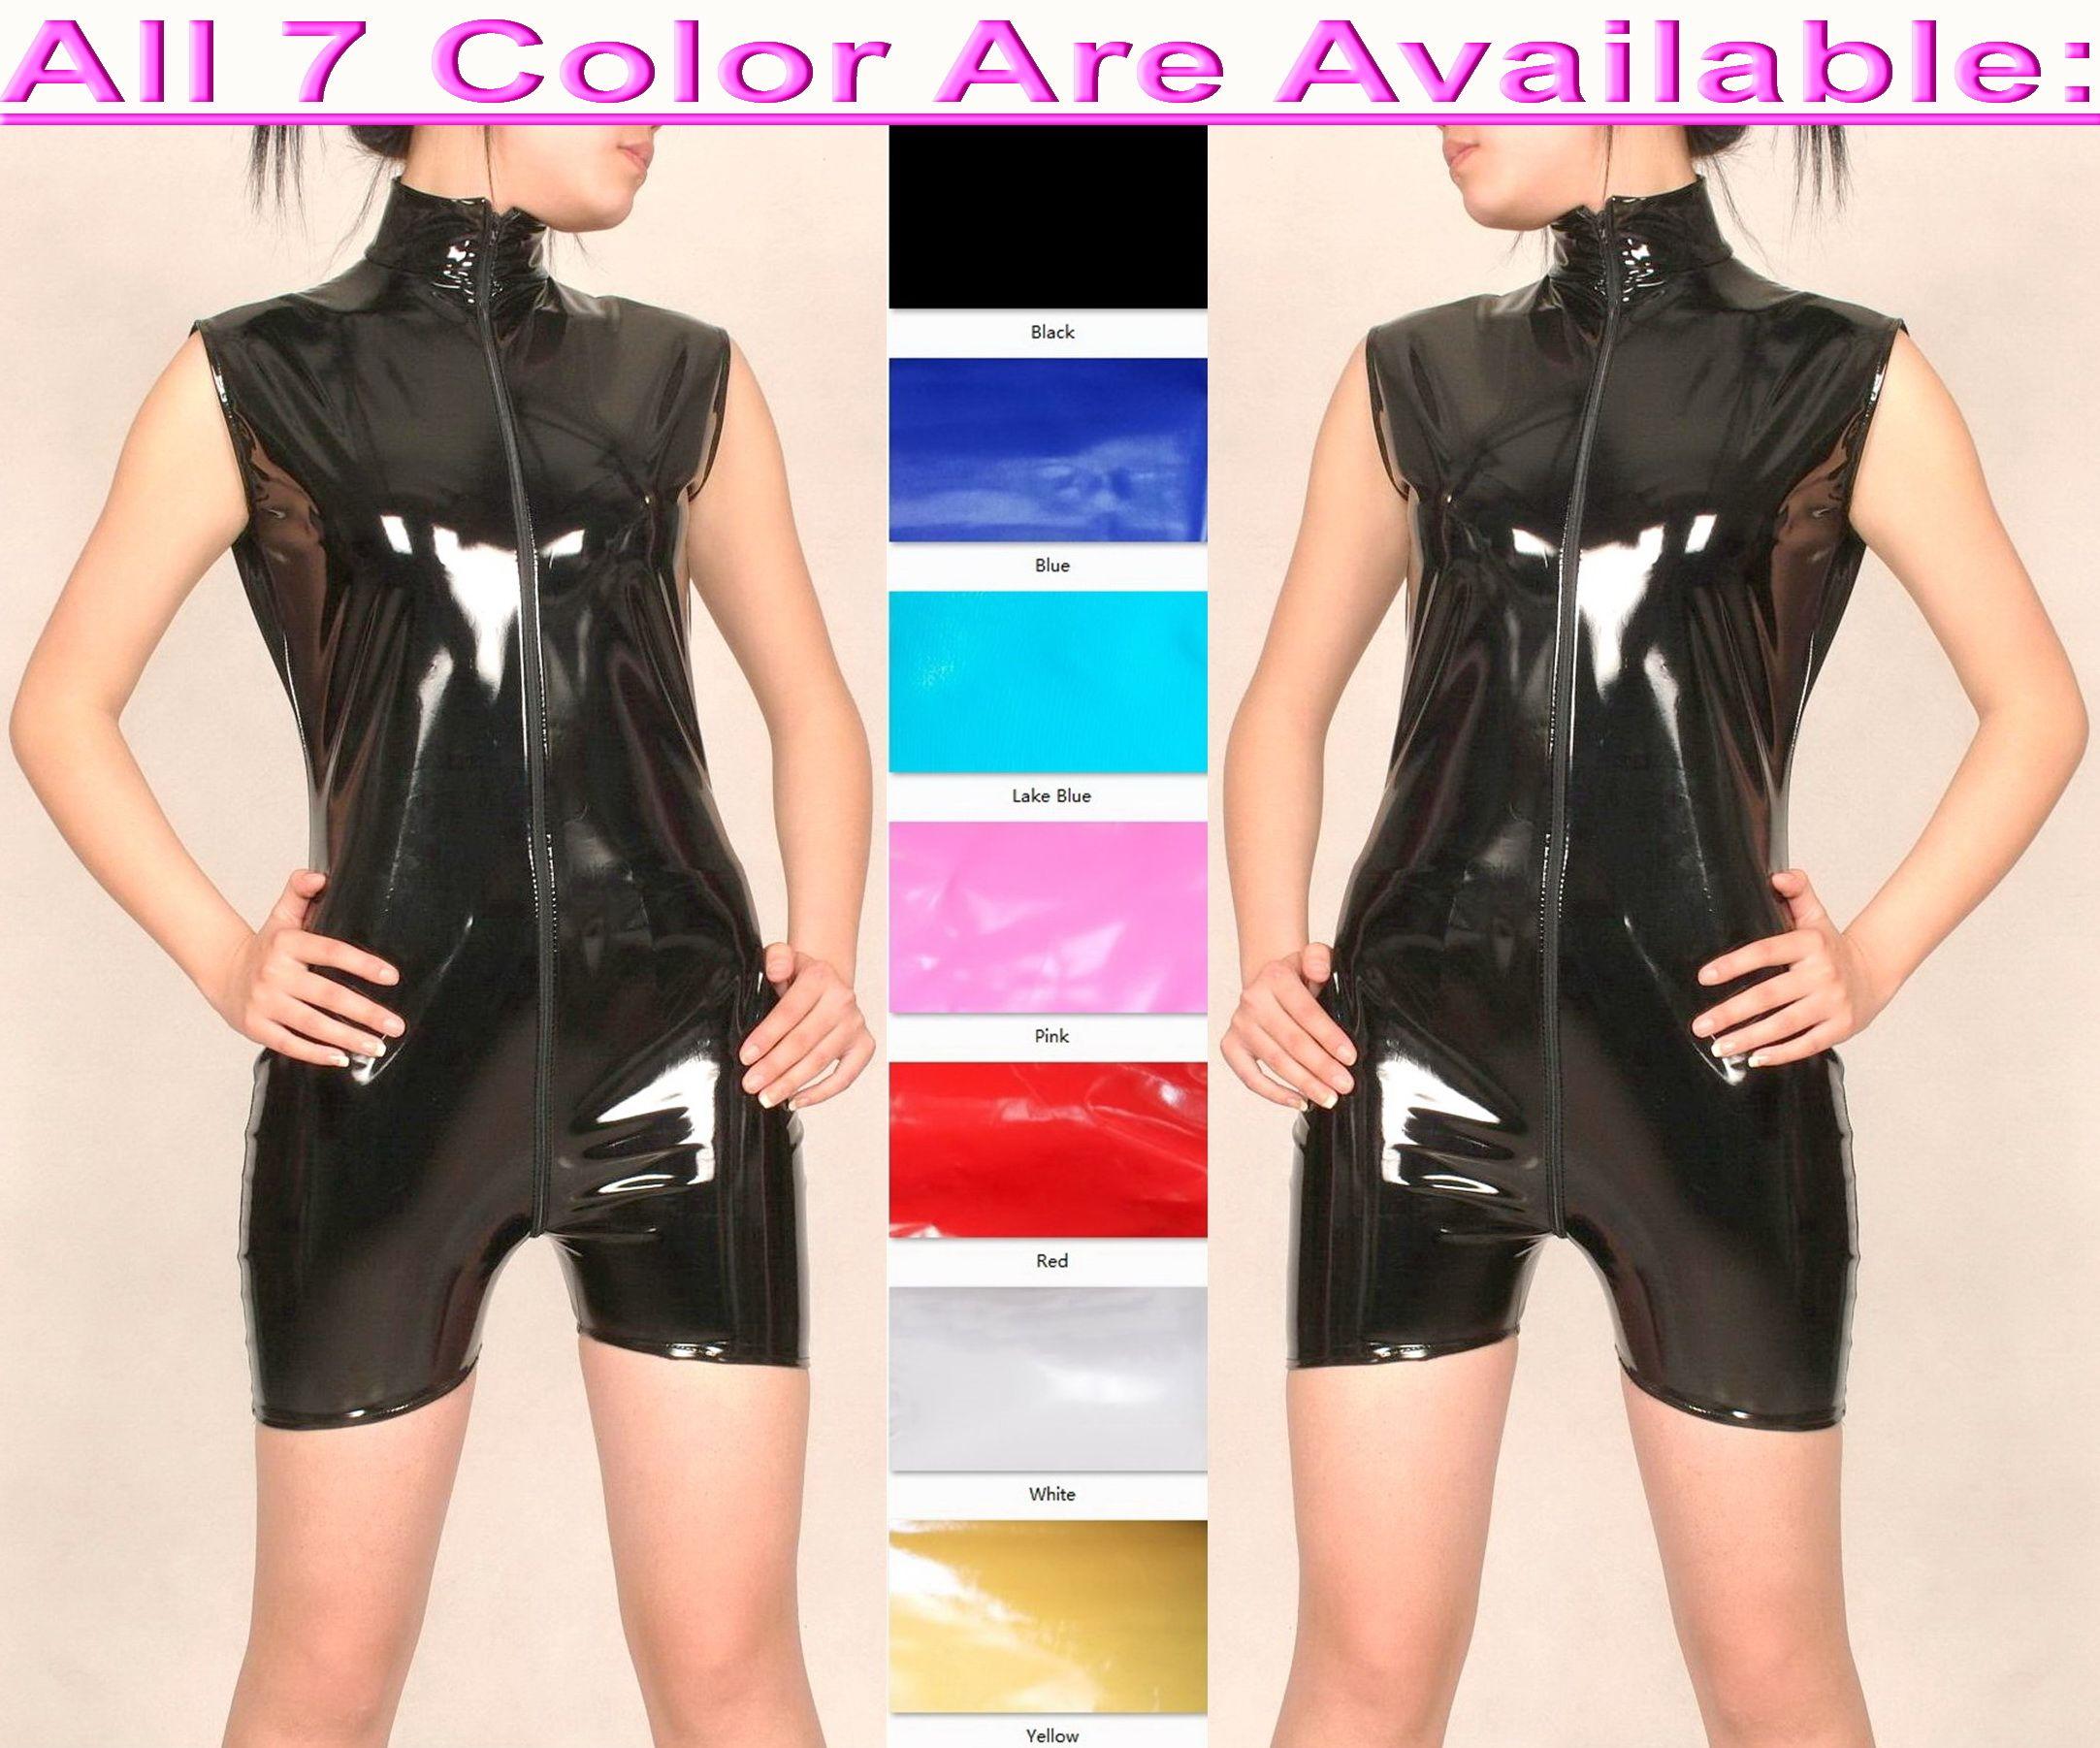 Sexy Women Men Short Body Suit Costumes Sleeveless 7 Color Shiny PVC Catsuit Unisex Bodysuit Front Extra Long Zipper Halloween Party Fancy Dress Cosplay Costume M733